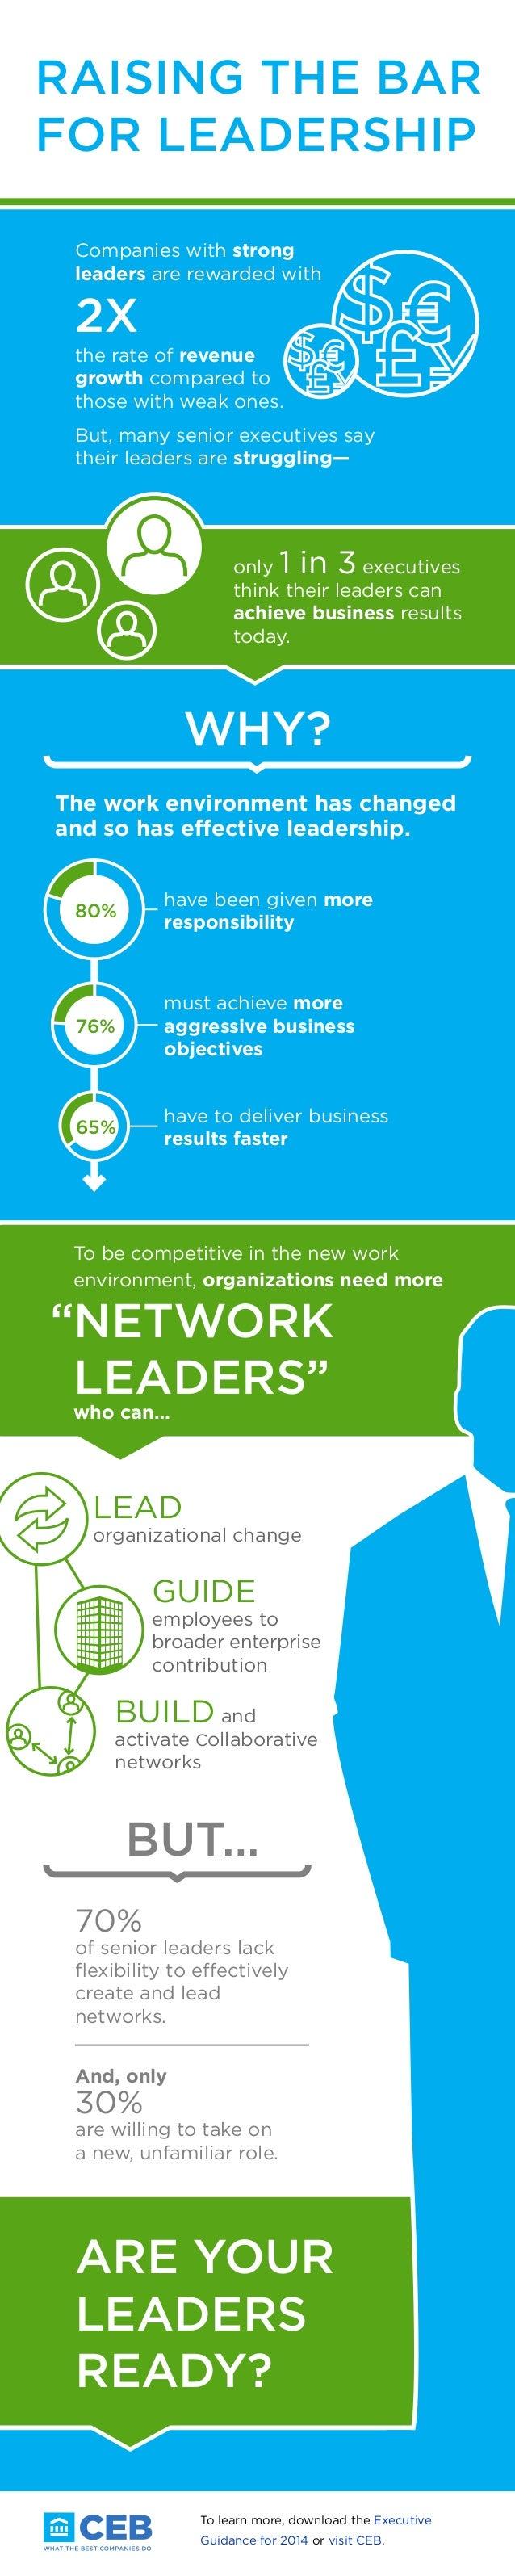 Raising the-bar-for-leadership-ceb-executive-guidance-2014-infographic